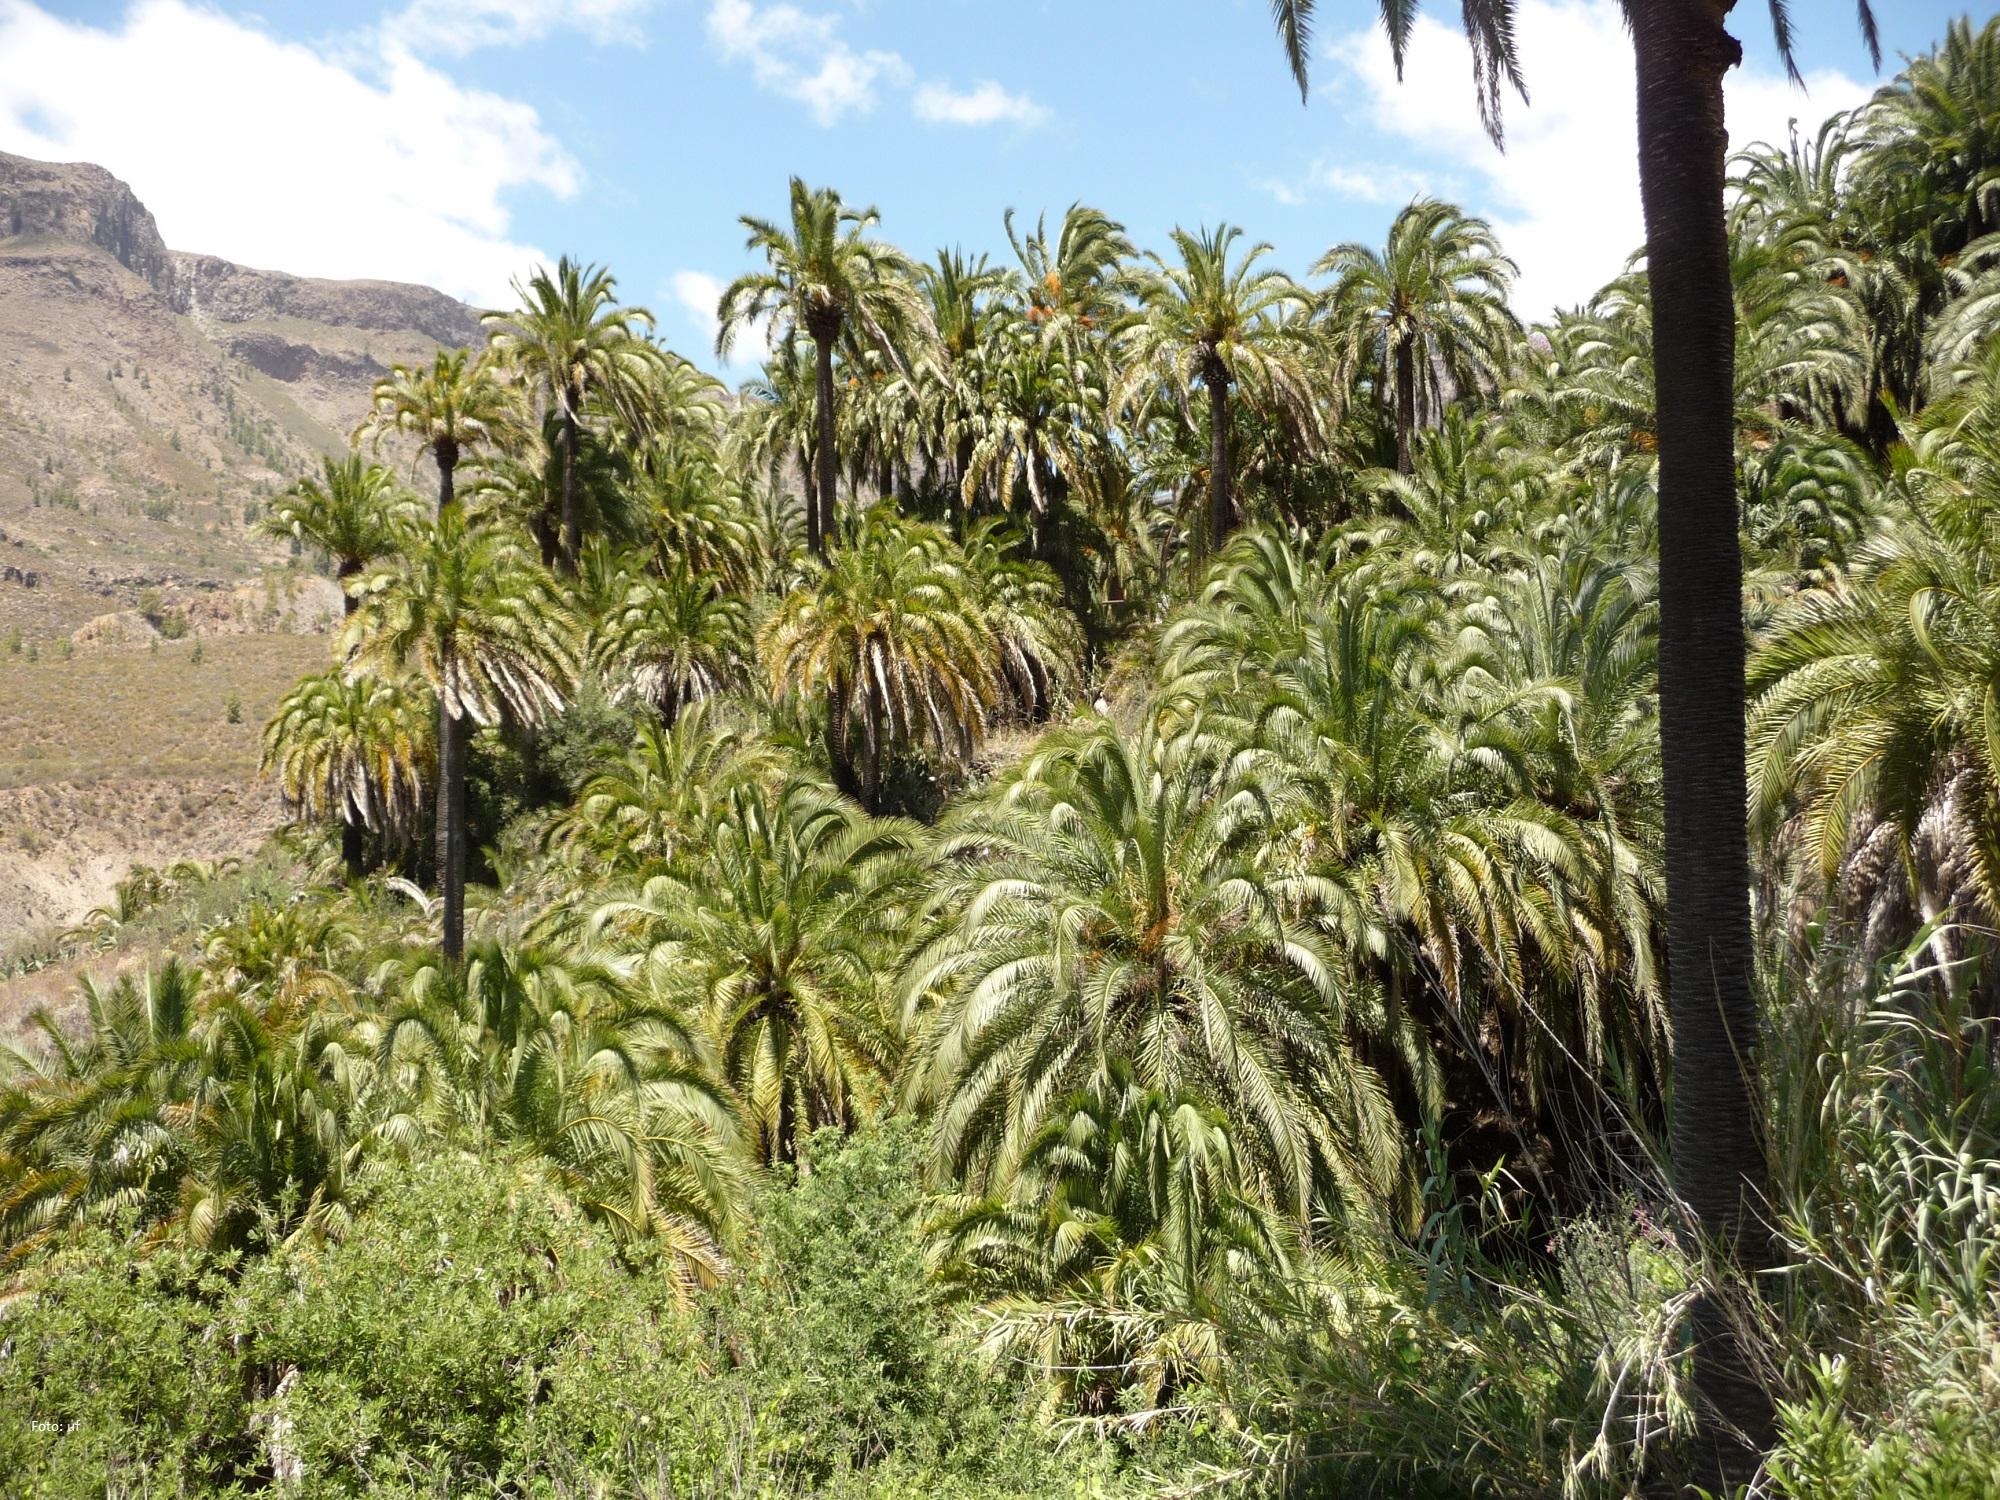 Palmenoase 2 km von Fataga entfernt